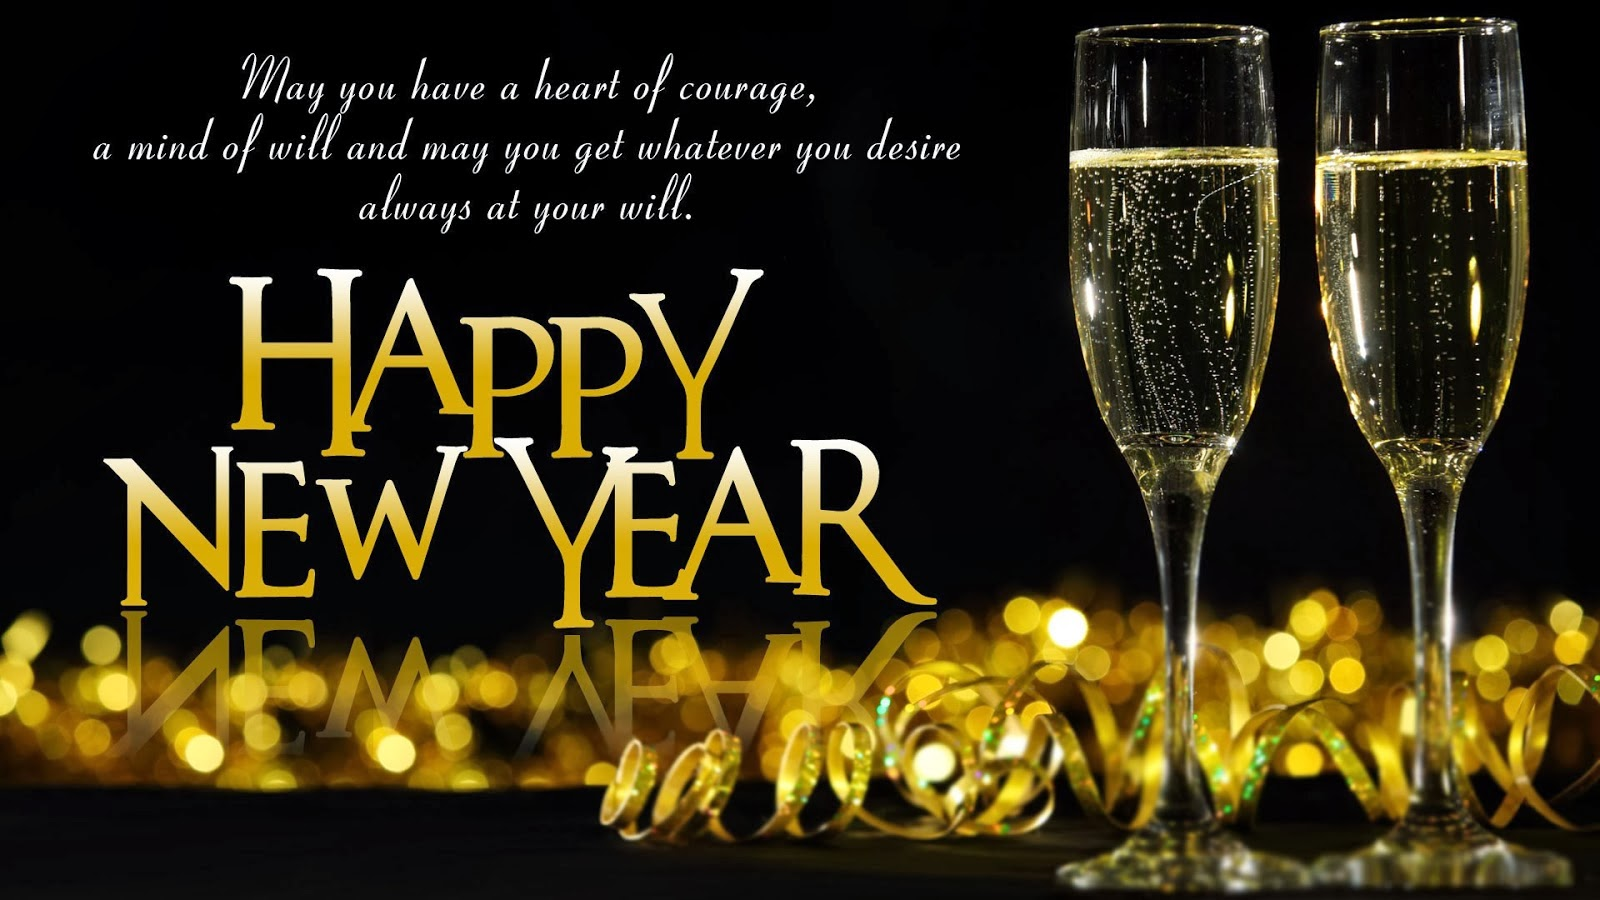 70] Happy New Years 2015 Wallpaper on WallpaperSafari 1600x900